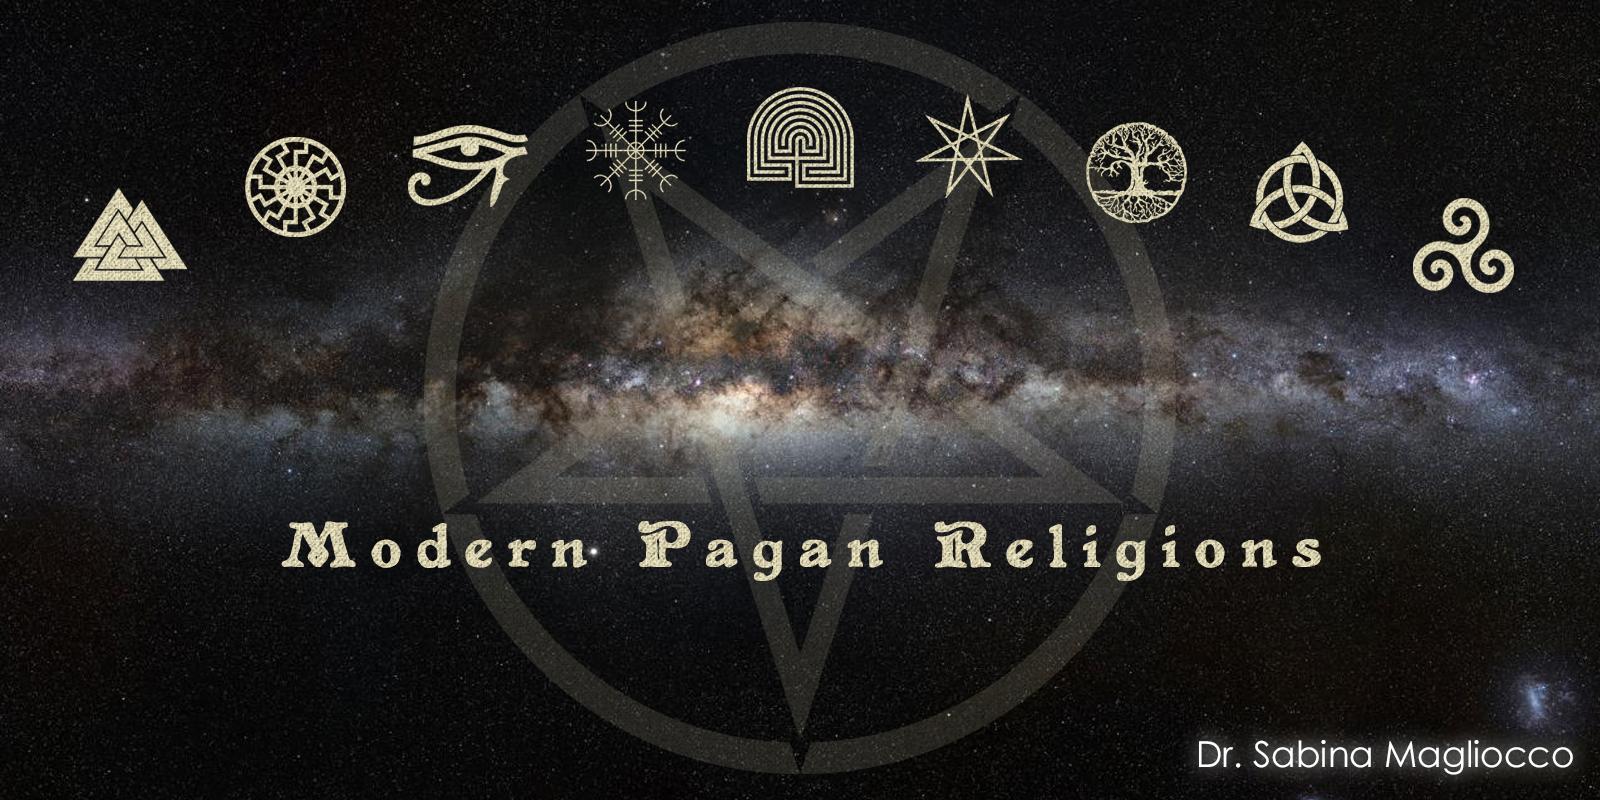 Modern Pagan Religions